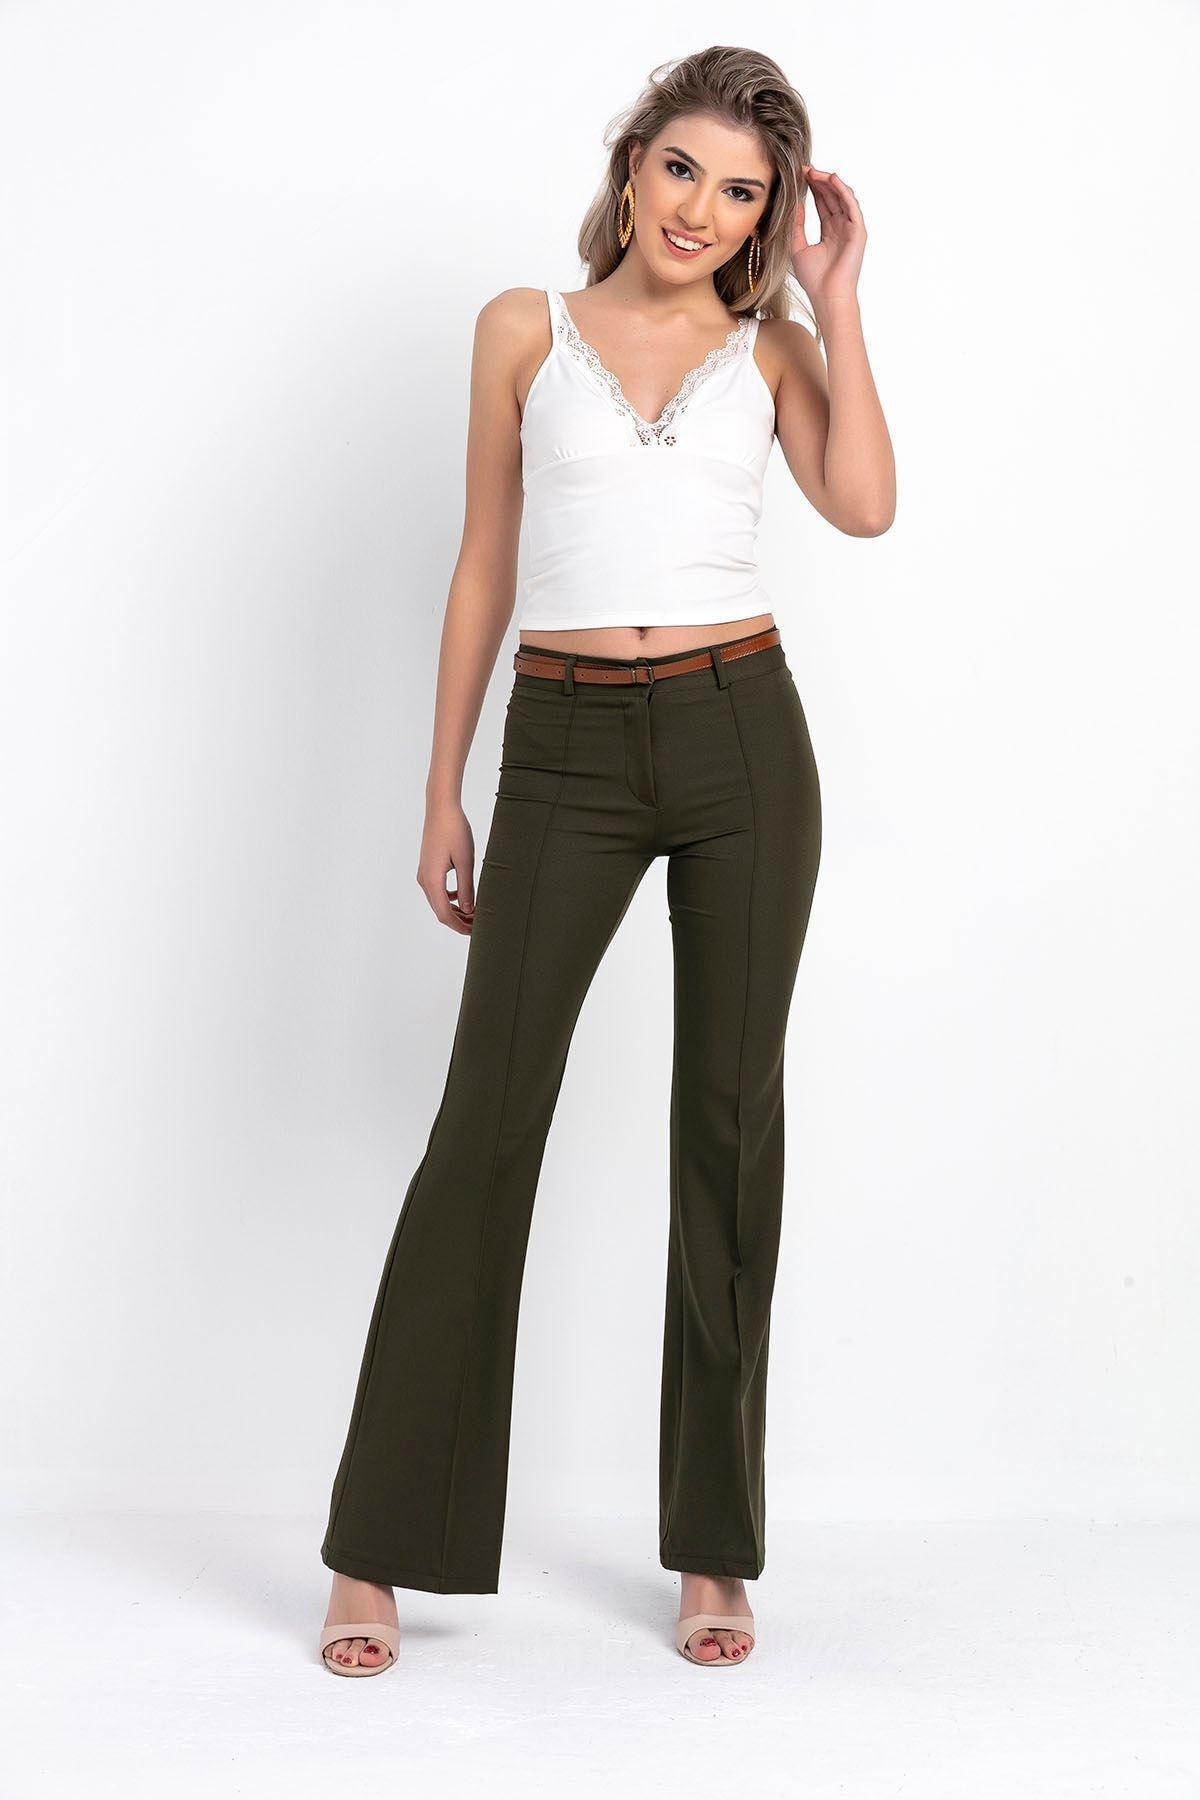 Kadın Haki Ispanyol Paça Kumaş Pantolon